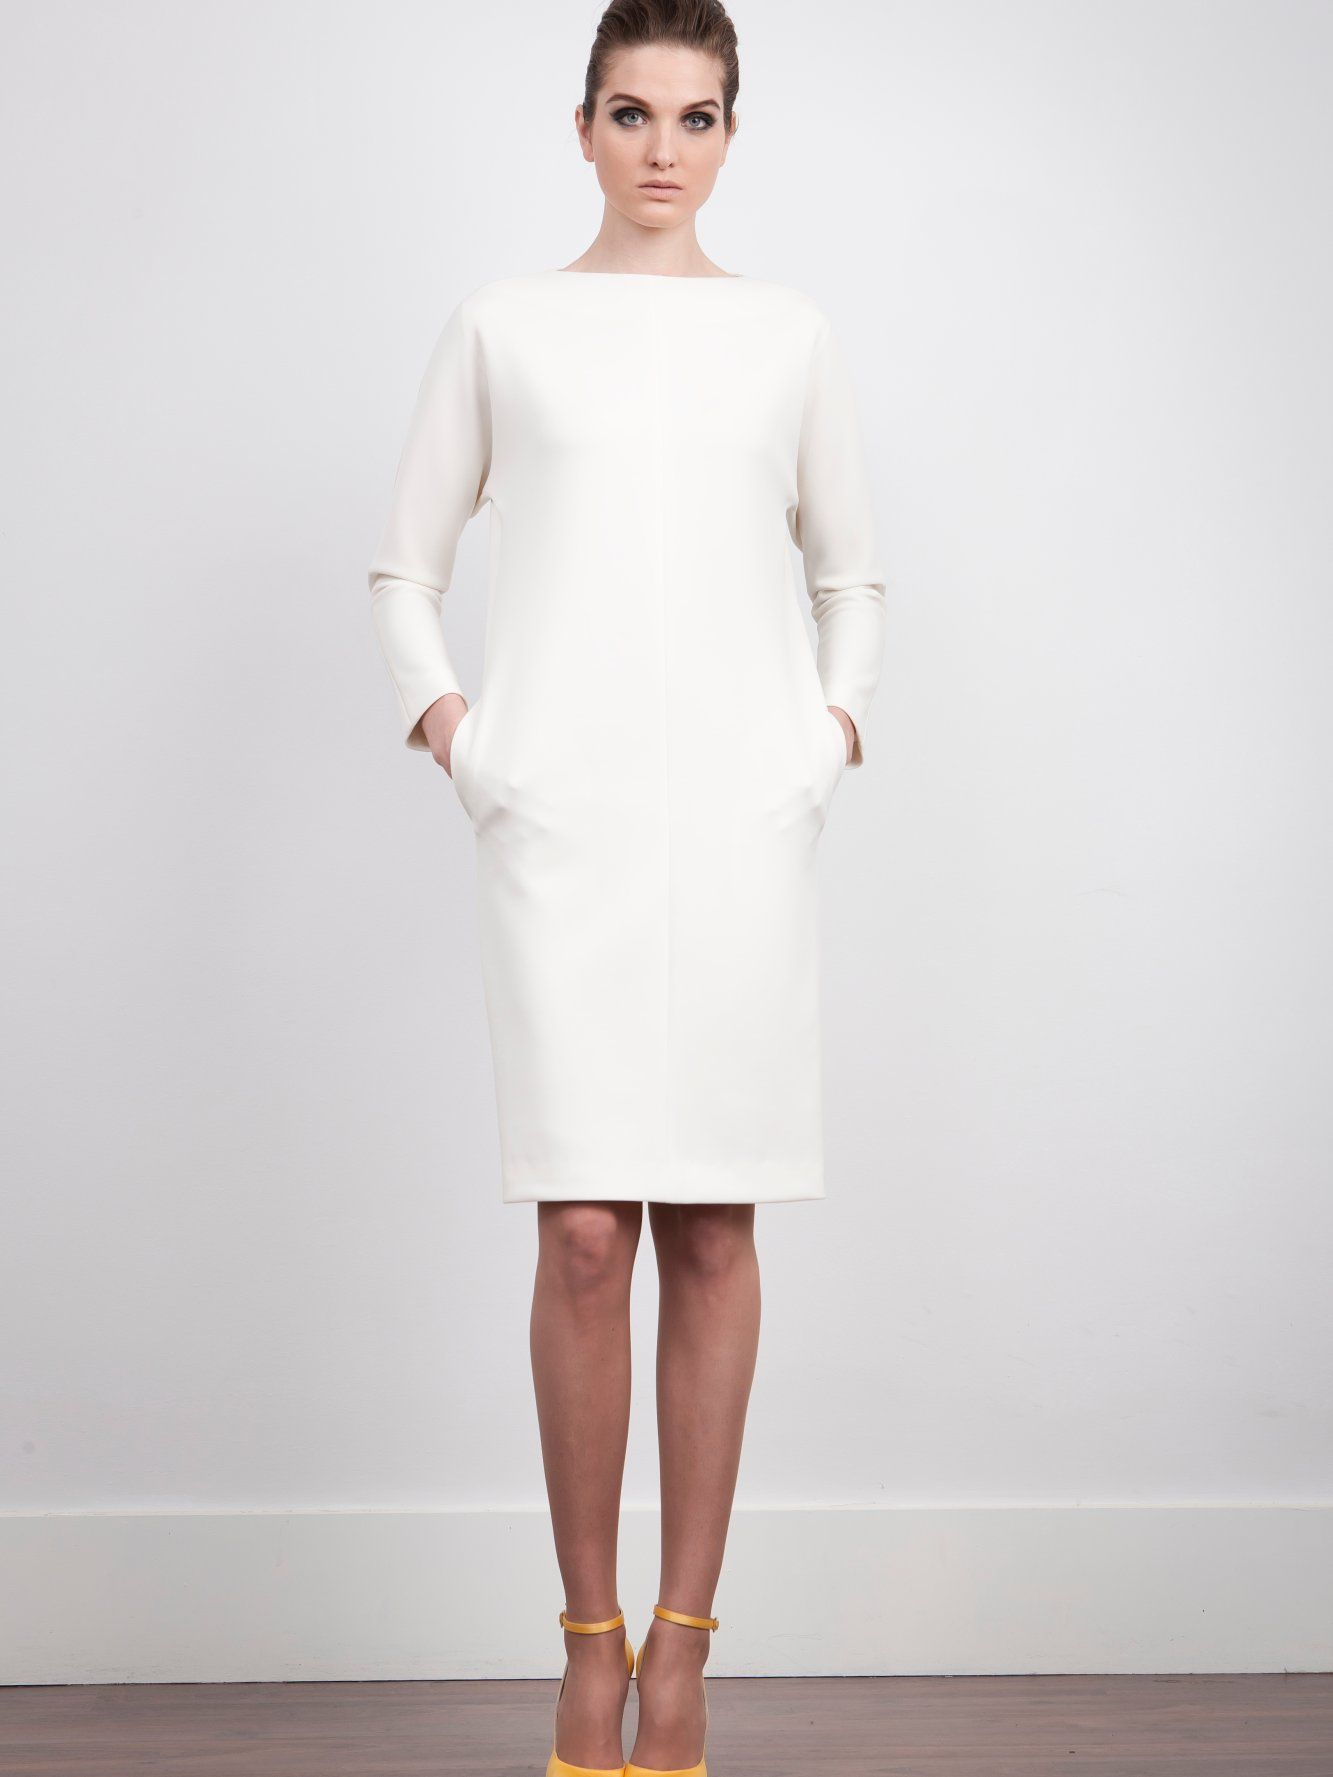 17c1af38f10 The 2nd Skin Co. White neoprene dress. Long sleeve. #Fashion #Women #Dress